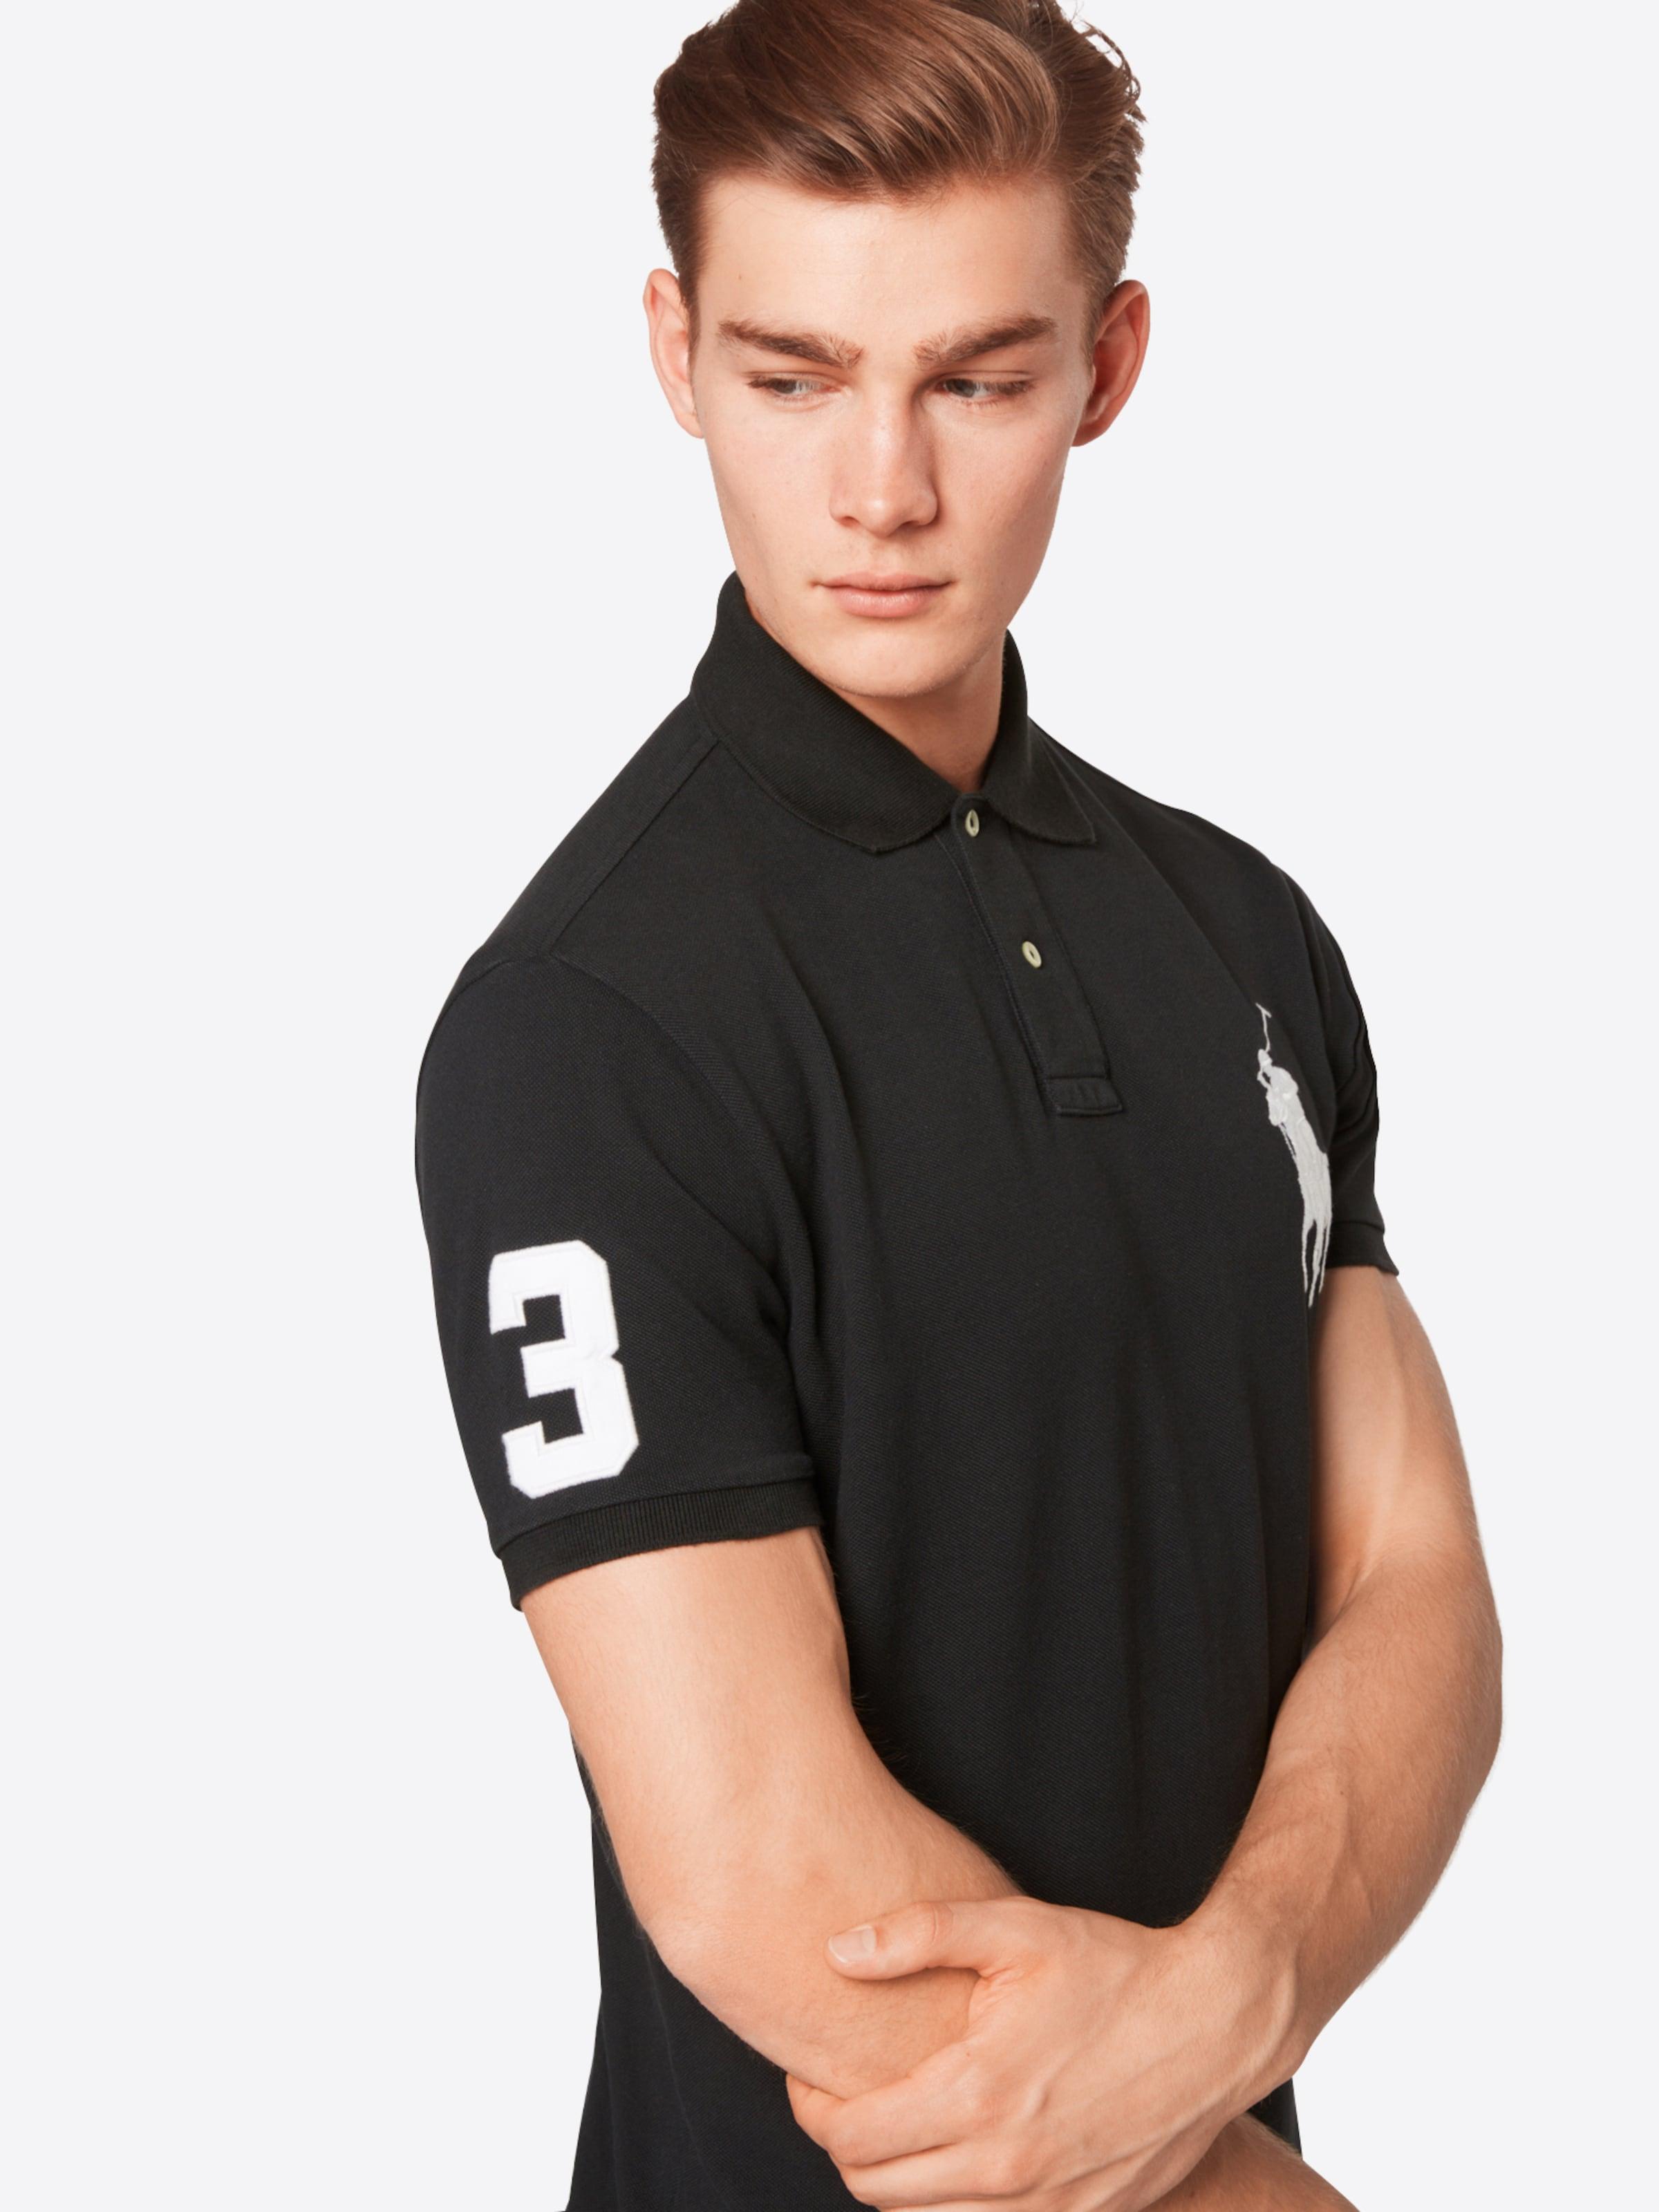 Ralph 'sskcbppcmsl Lauren knit' shirt T short Polo NoirBlanc Sleeve En kZwOPiXulT